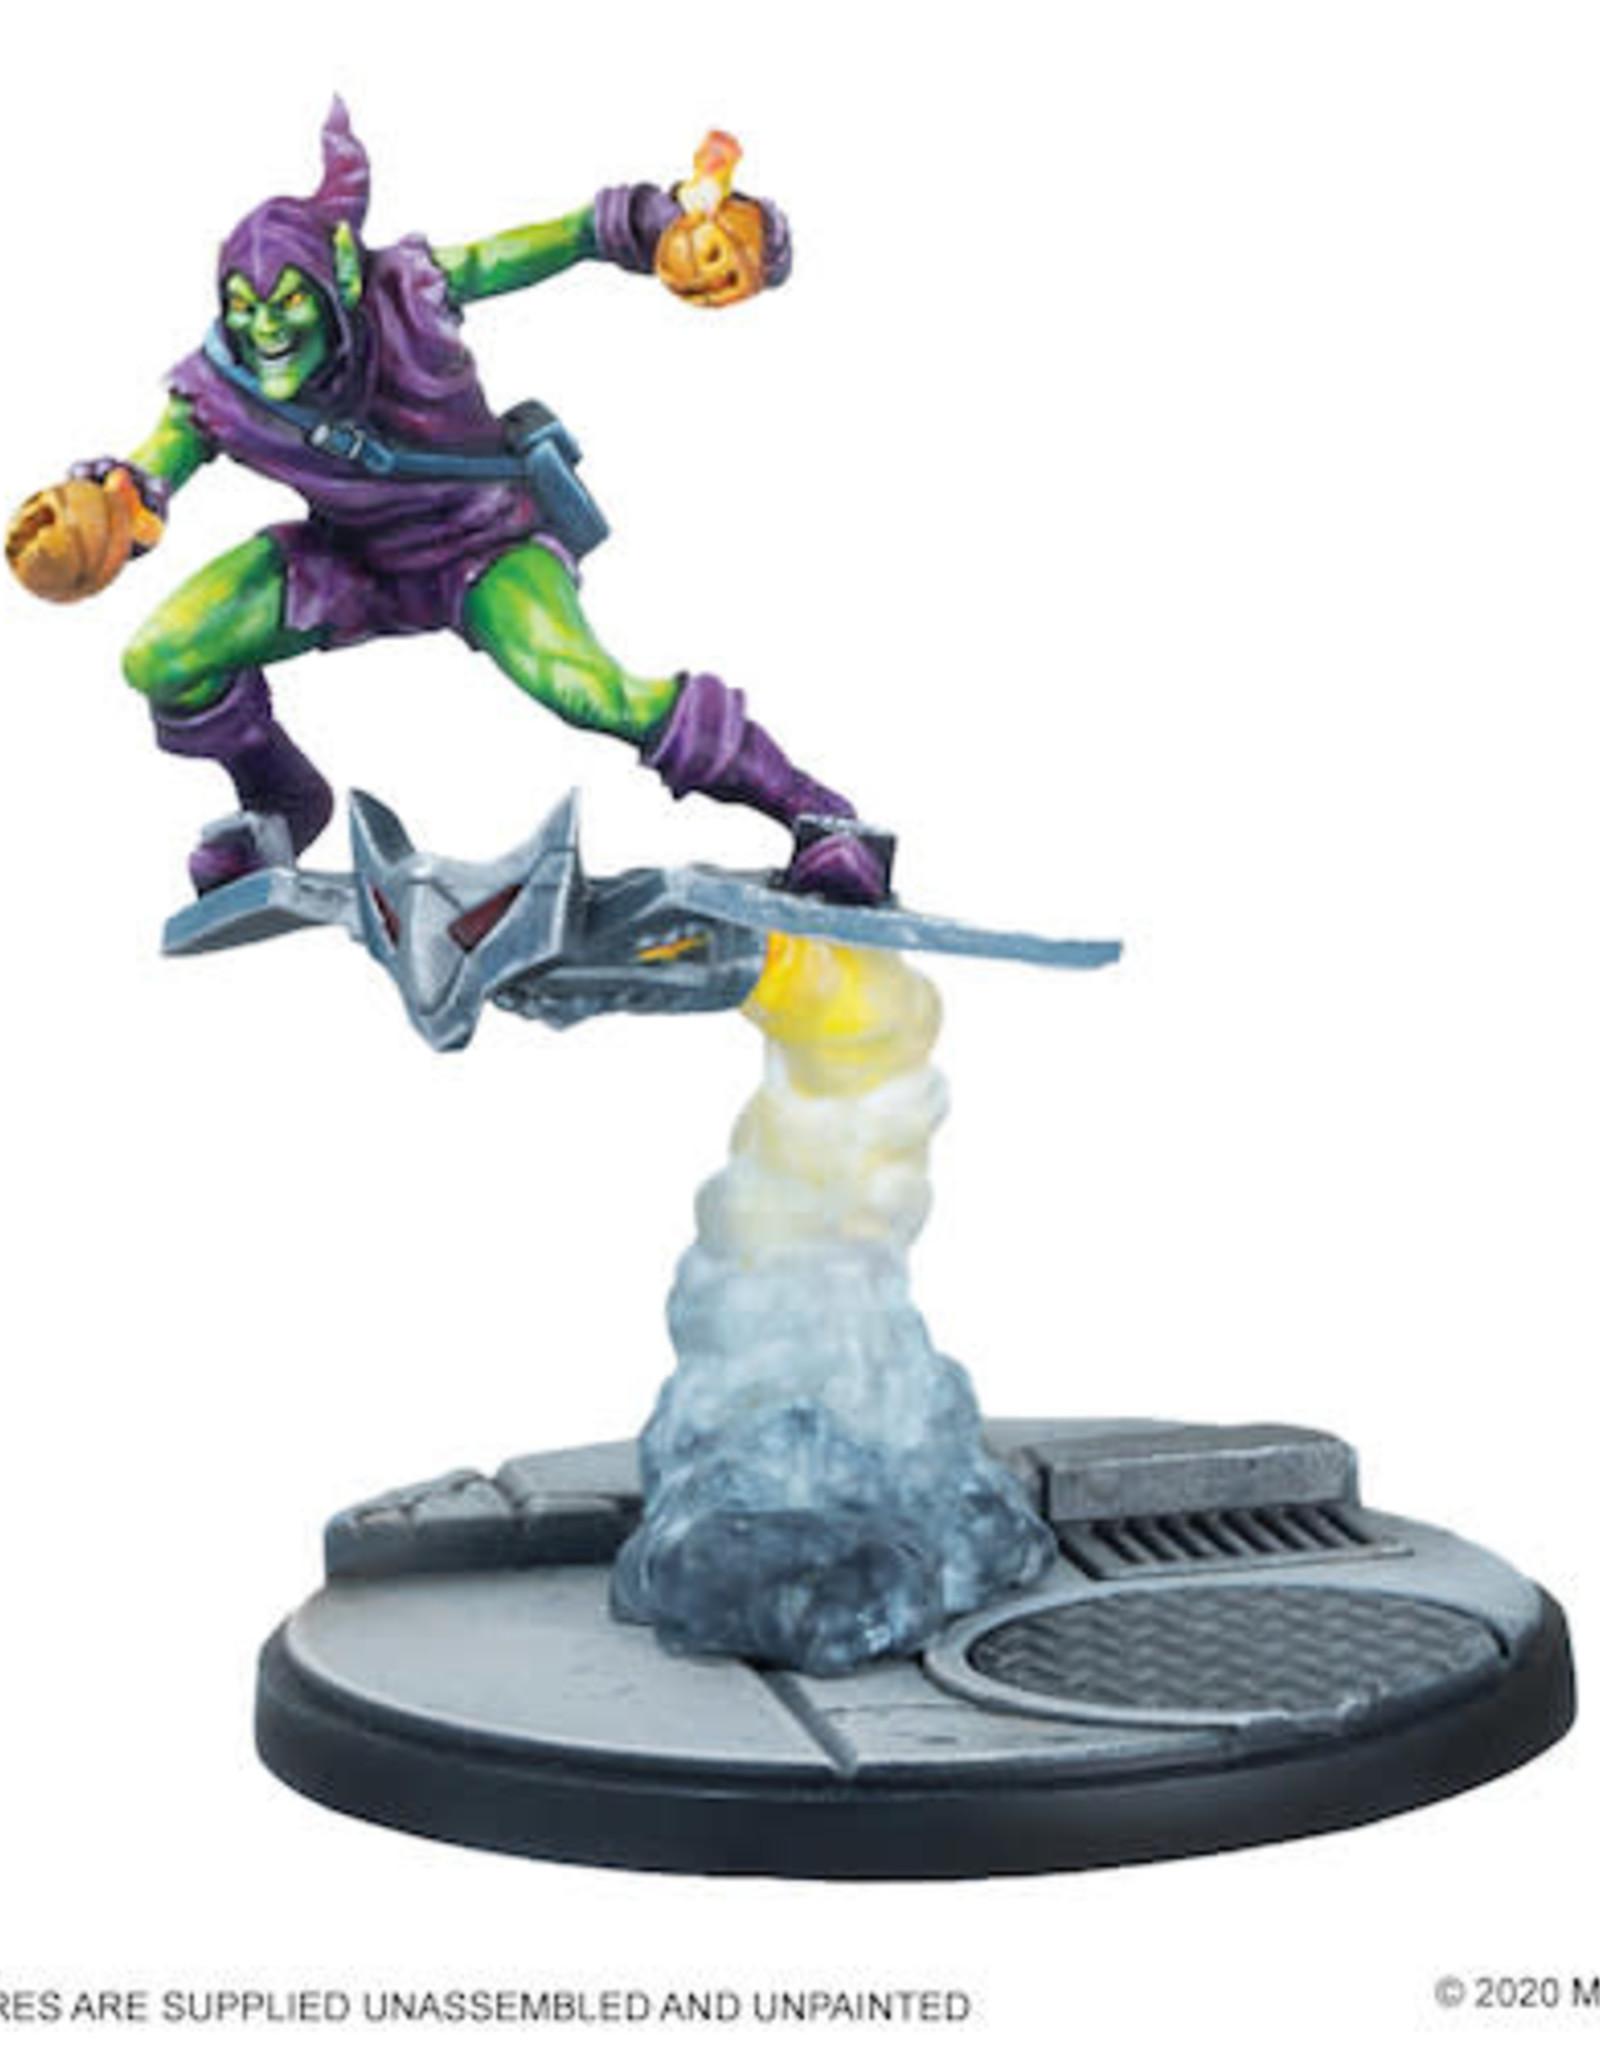 Atomic Mass Marvel Crisis Protocol: Green Goblin